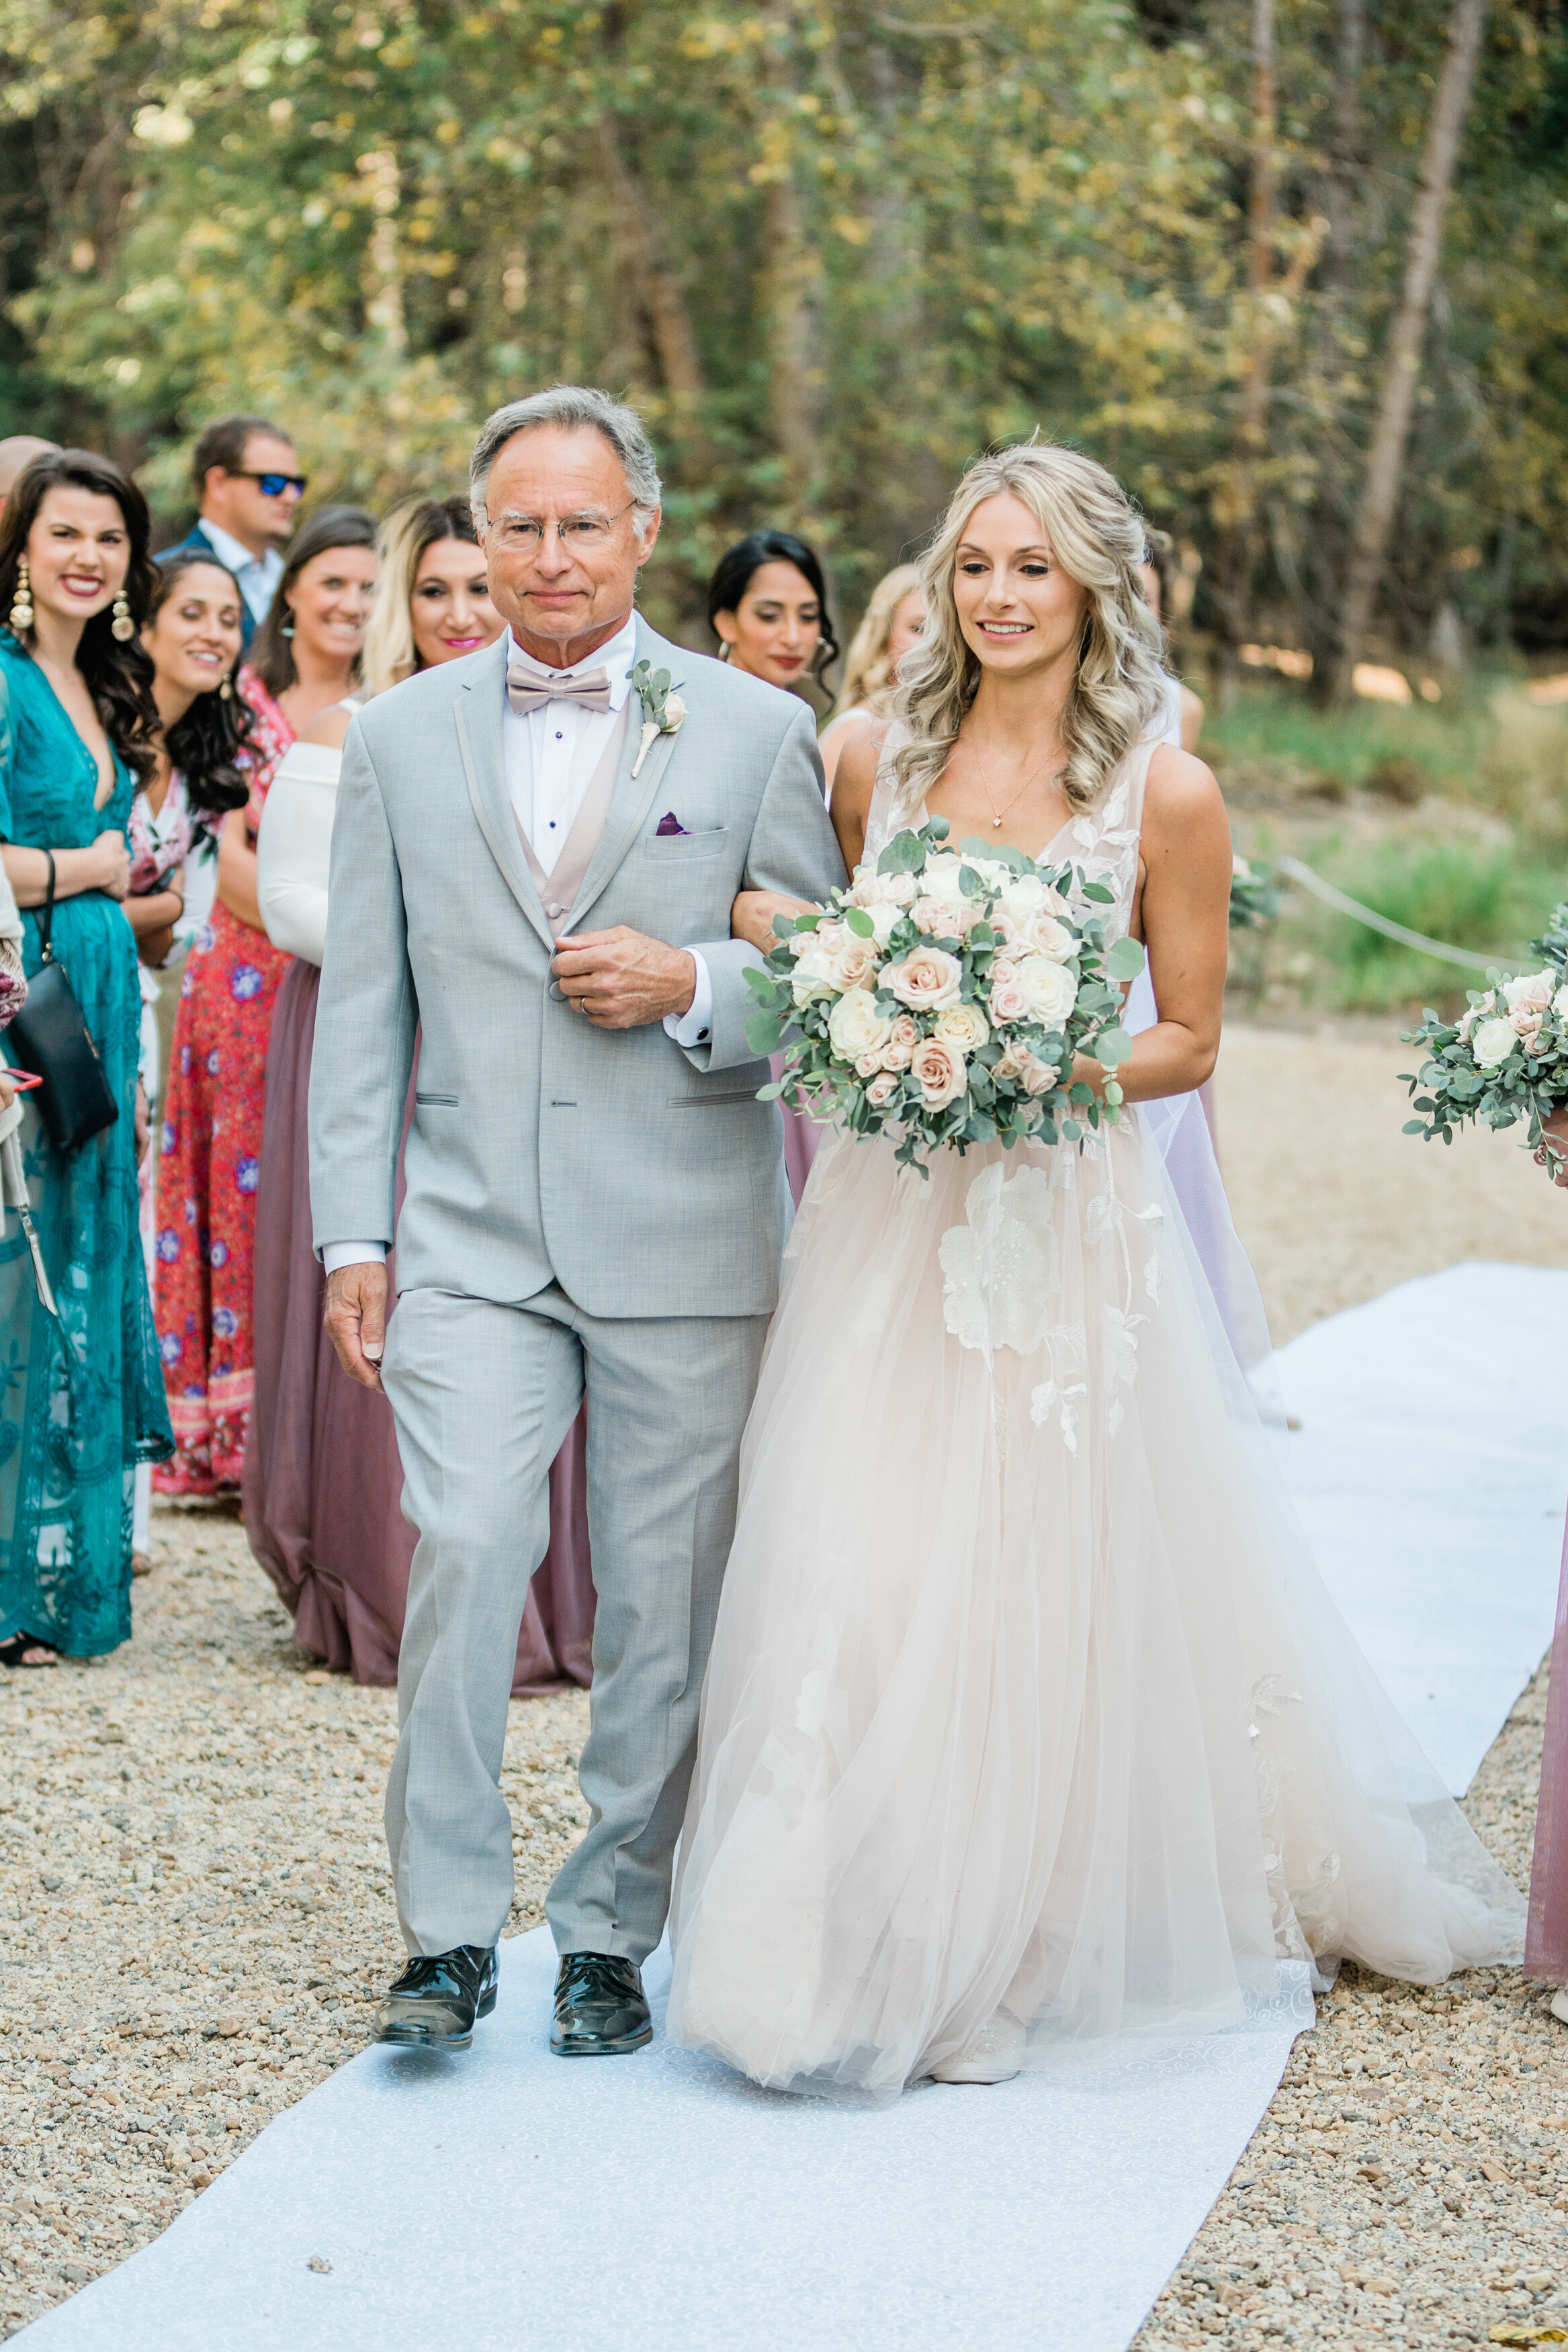 Leanne and Joe - Married - Sneak Peeks - Lauren Alisse Photography-14.jpg